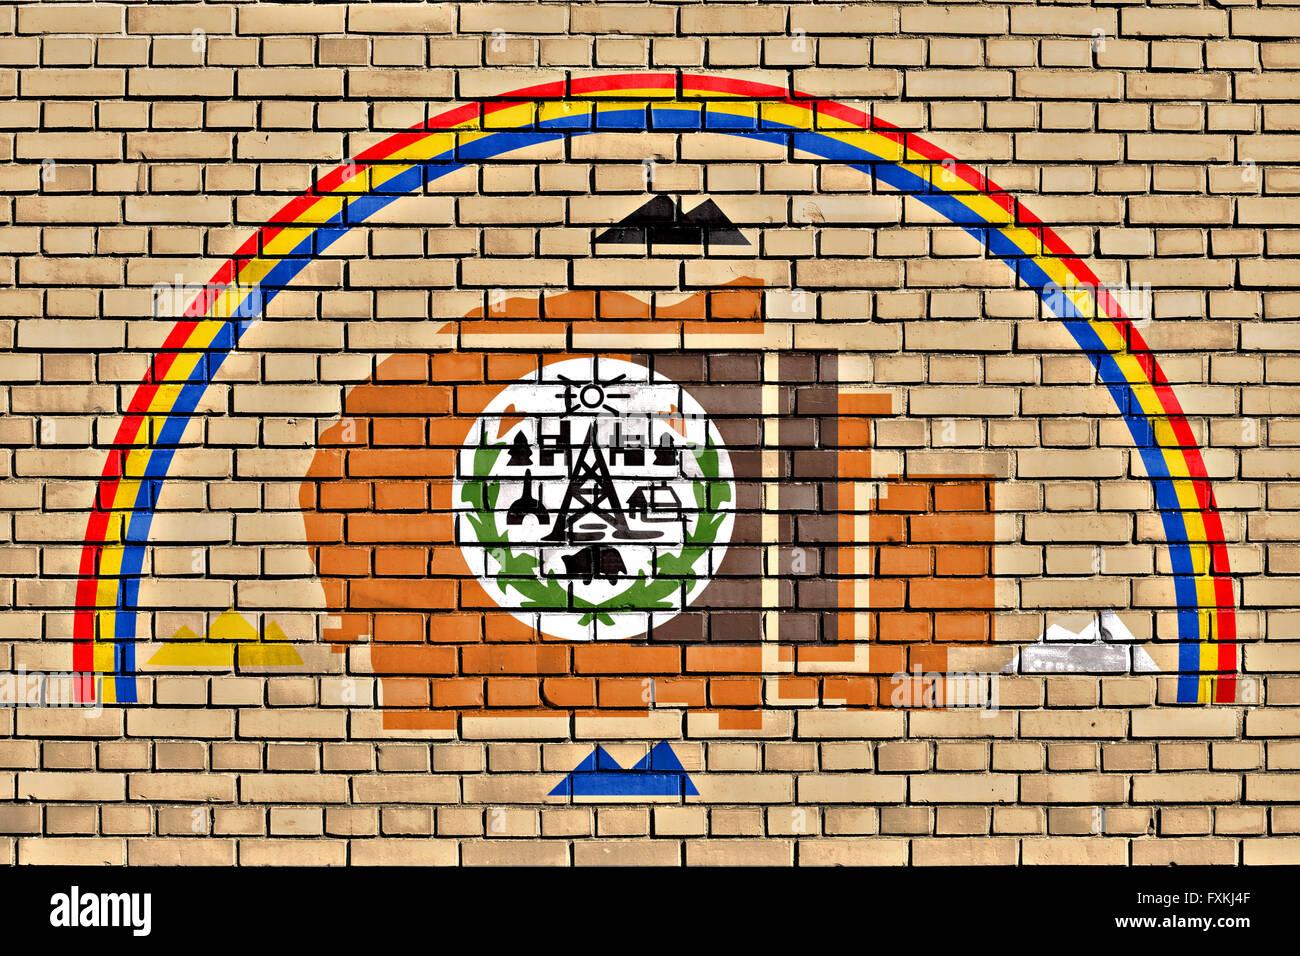 flag of Navajo Nation painted on brick wall - Stock Image